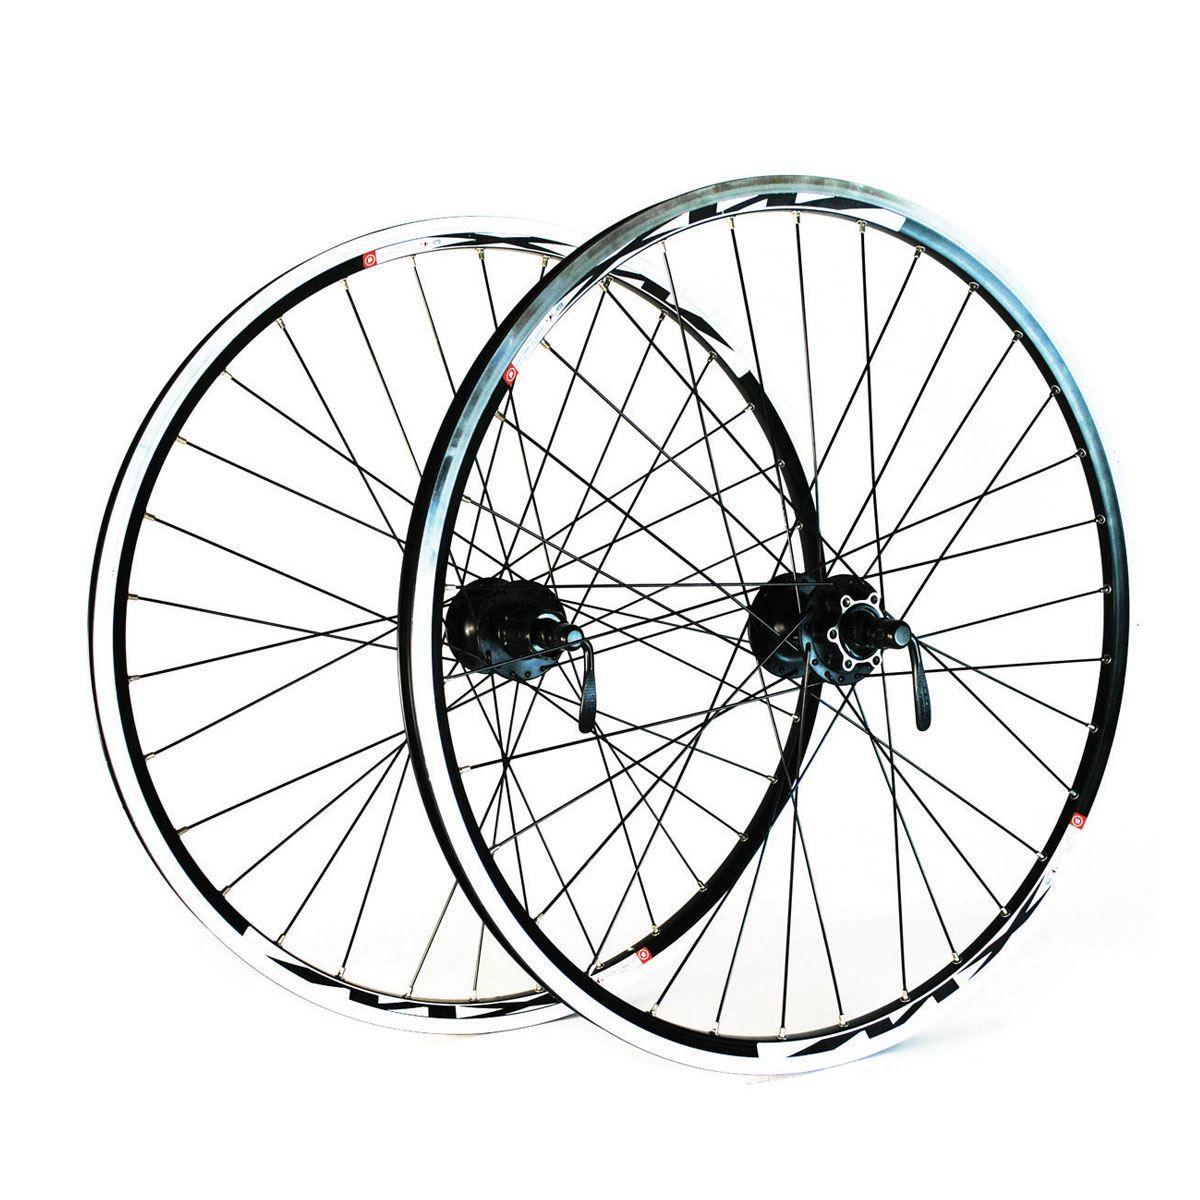 "Wilkinson 26X1.75 Front Wheel - Mach 1 Neuro Mtb Disc Rim - Shimano 475 32 Hole Black Spokes: White 26"""